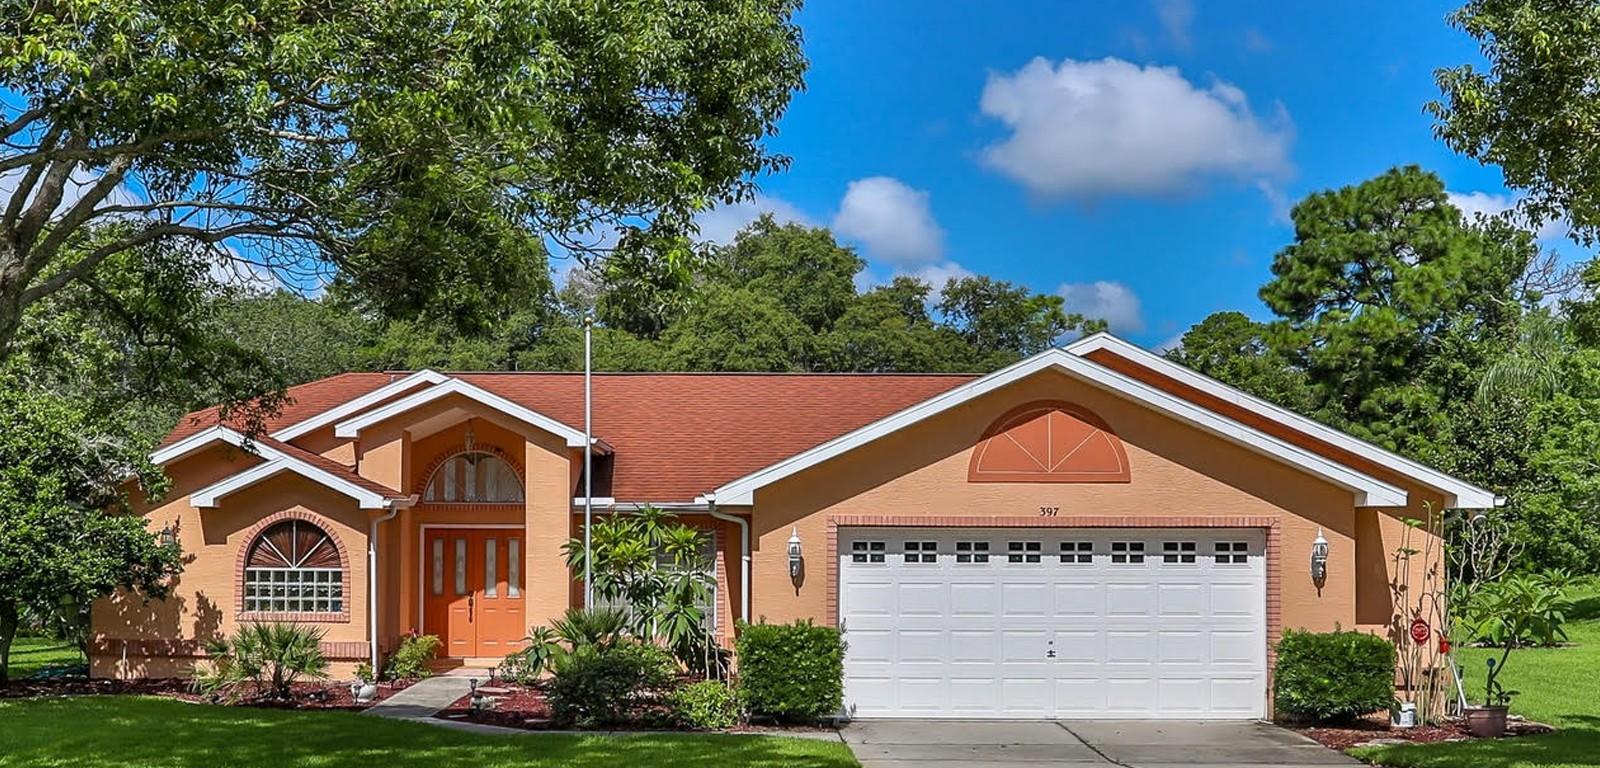 East Linden Estates - House with orange paint